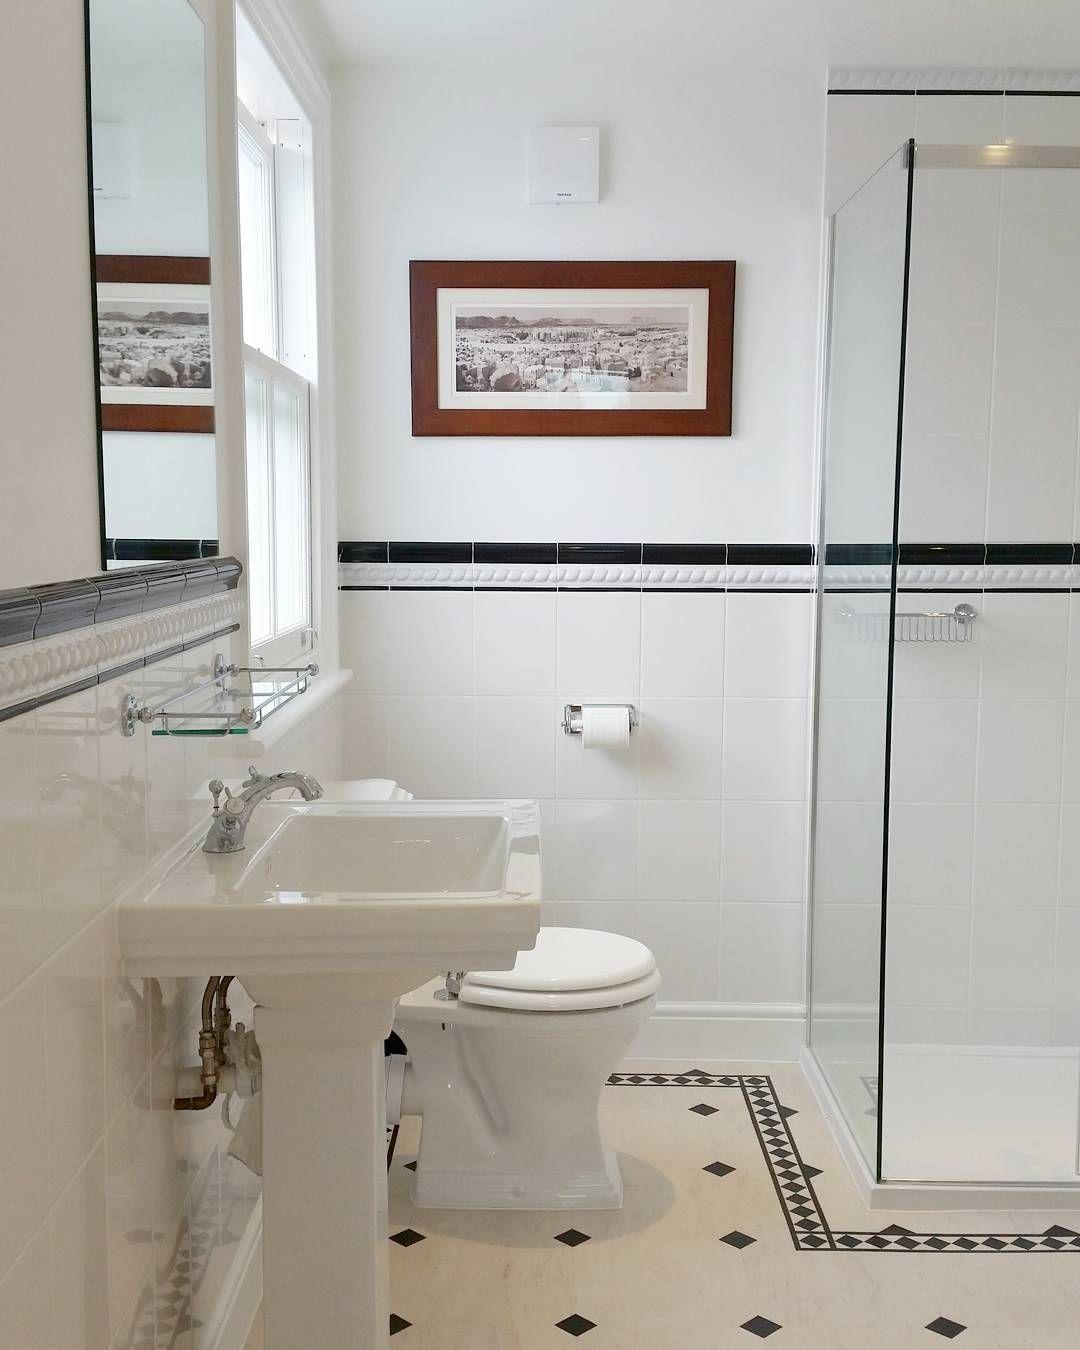 A gorgeous shower room in a loft built by @CubeLofts of Teddington ...